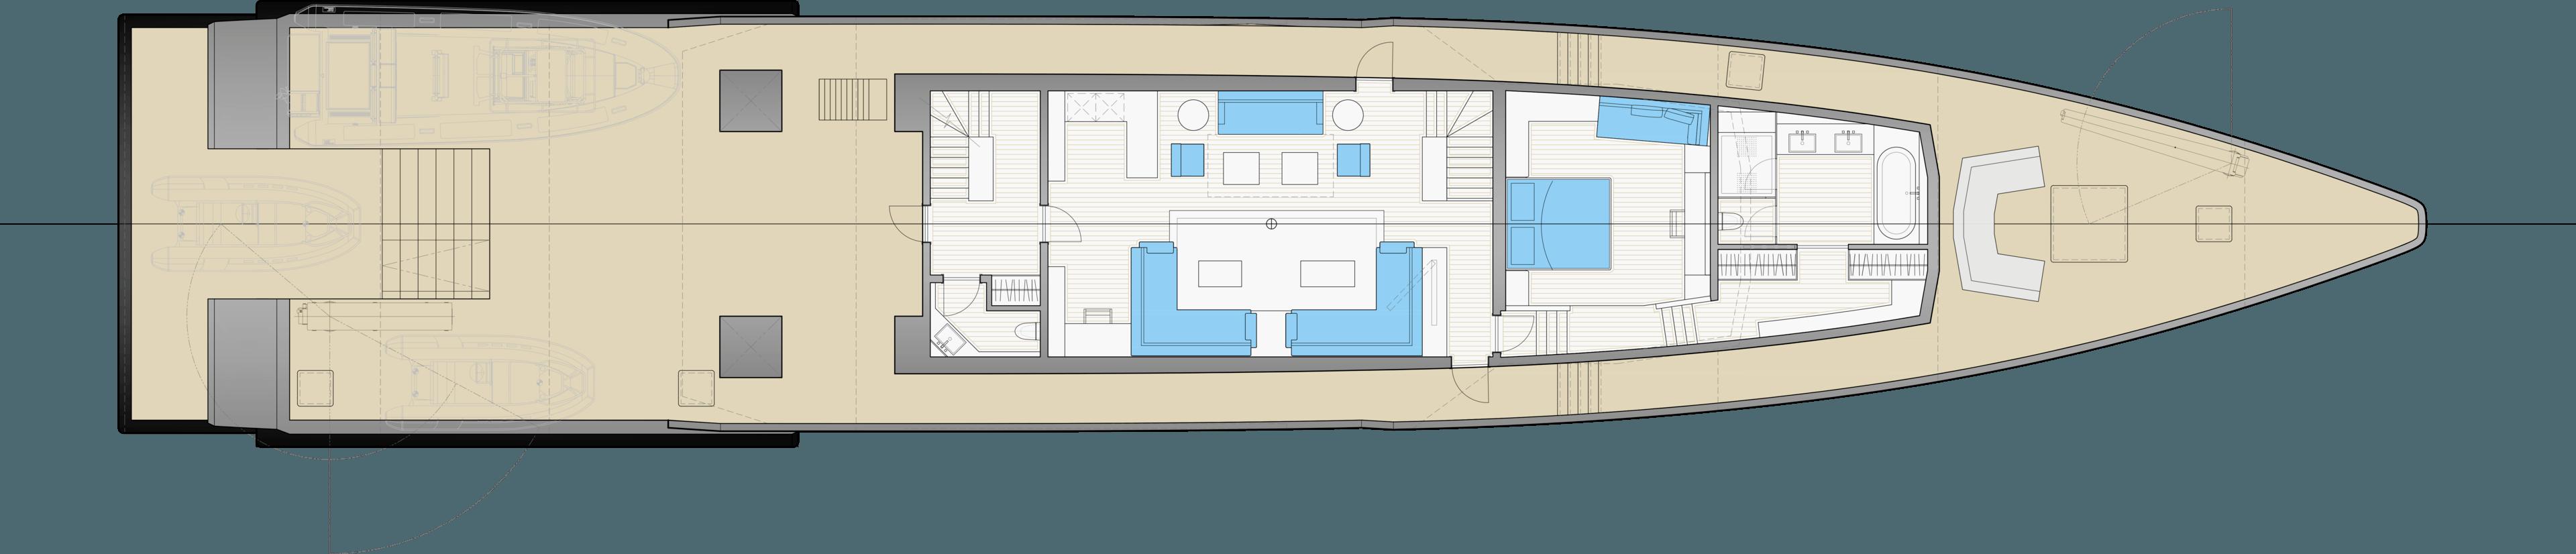 MMYD_063_45m Explorer Yacht GA_1_main deck.png